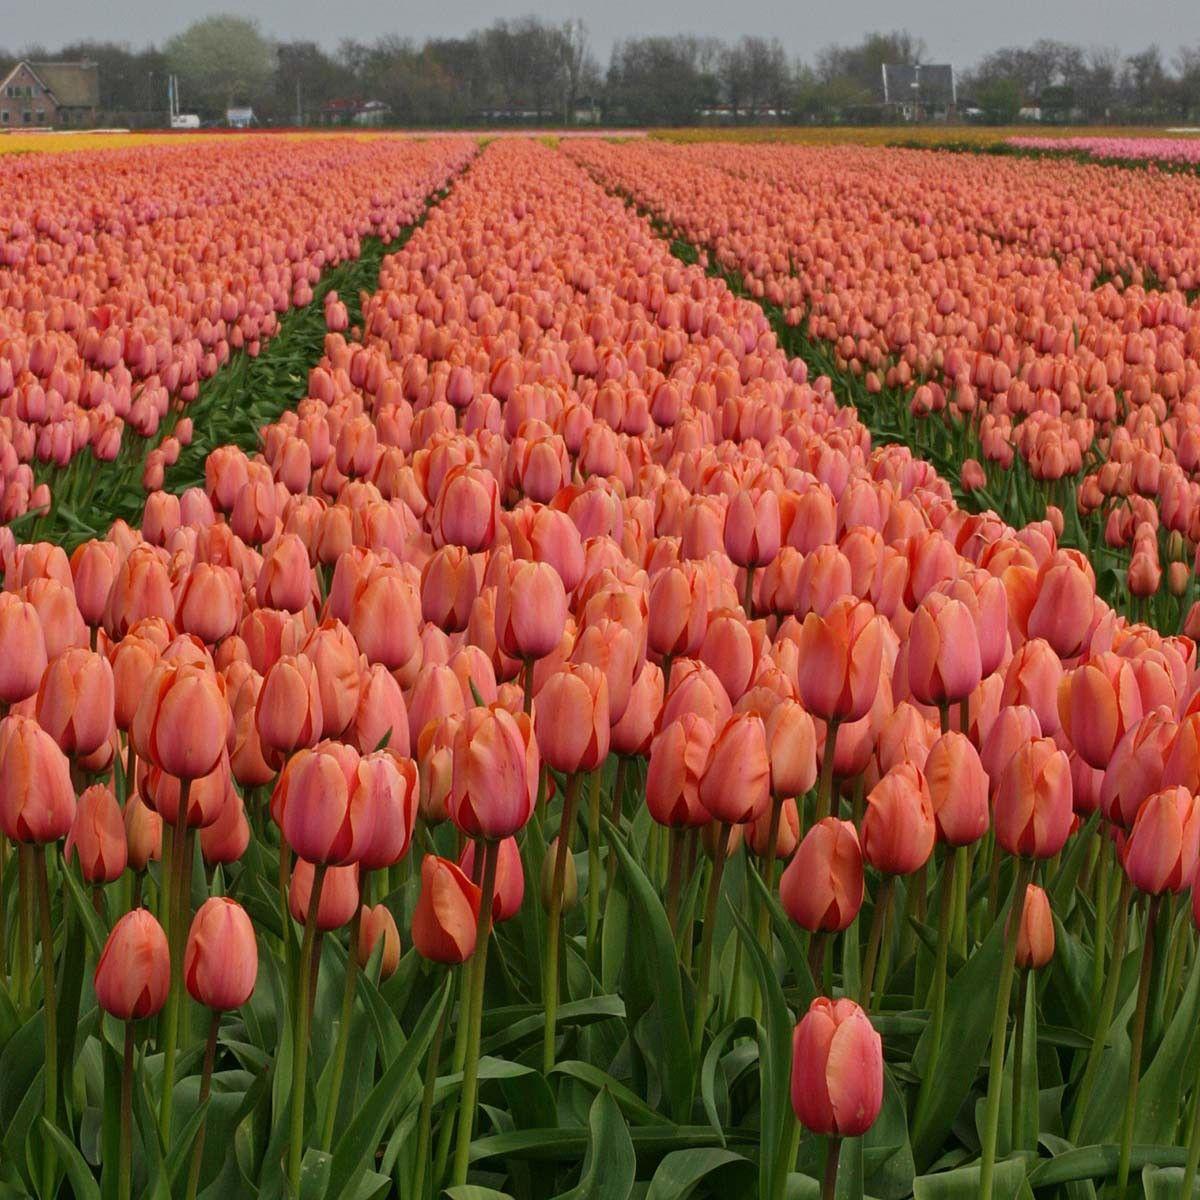 Tulipa Abricot Impression Tulip FieldsTulipsLandscaping Tulipa